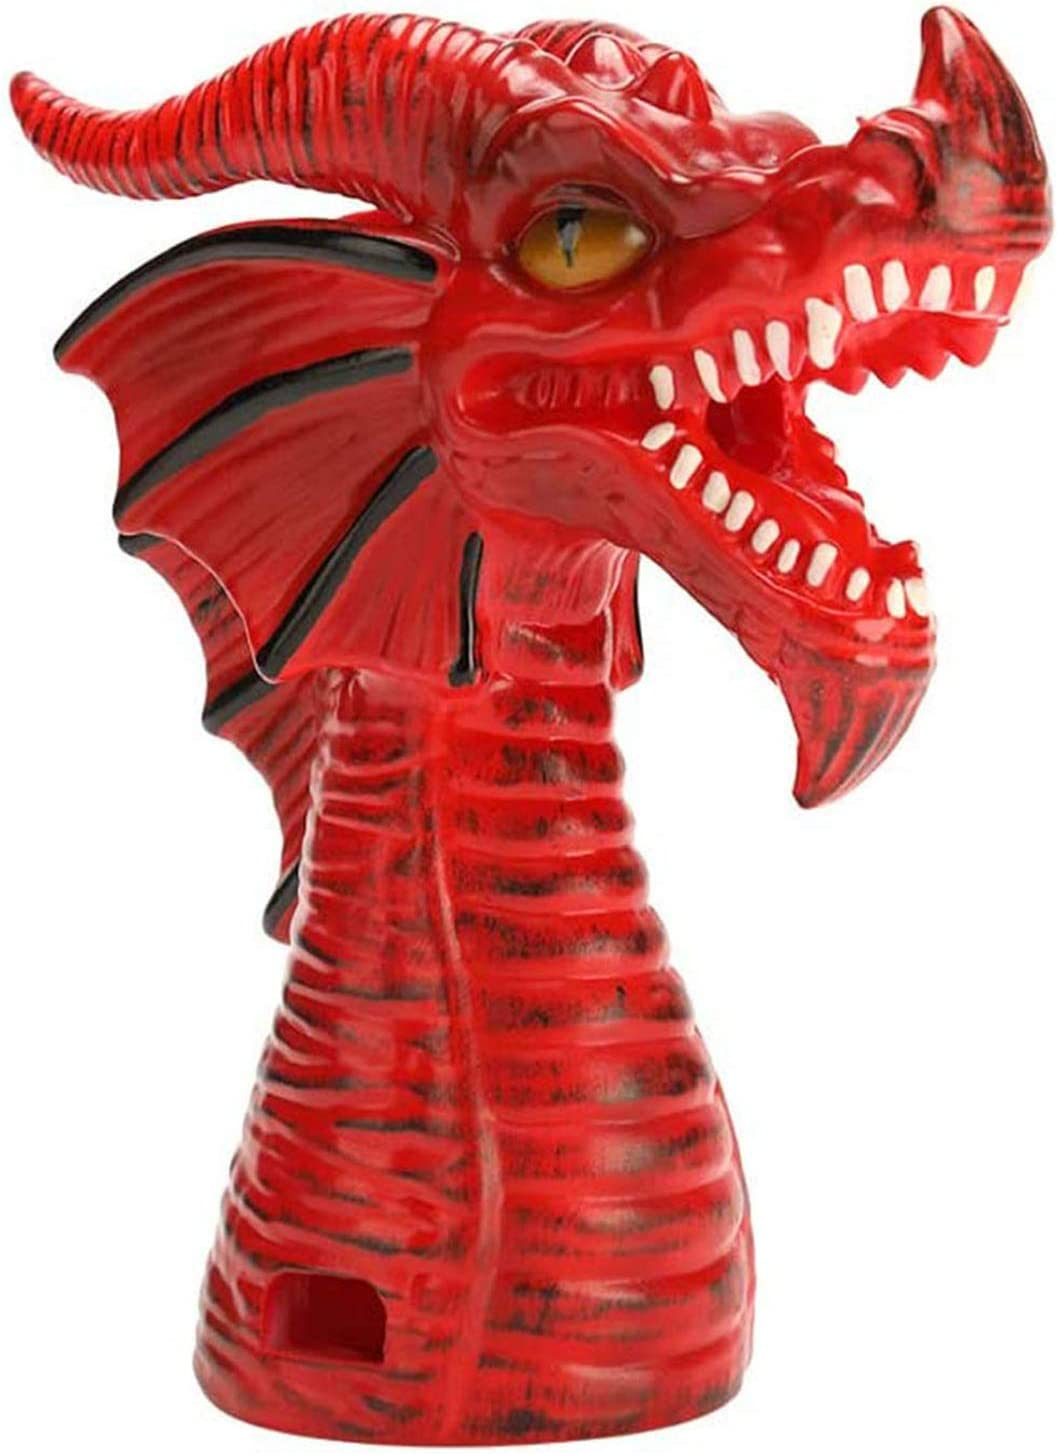 JOLIXIEYE Fire-breathing Dragon Steam Release Diverter Tool, Steam Release Diverter, Accessory for Pot Pressure Cooker,Cupboards/Cabinets Savior Cooker Kitchen Supplies